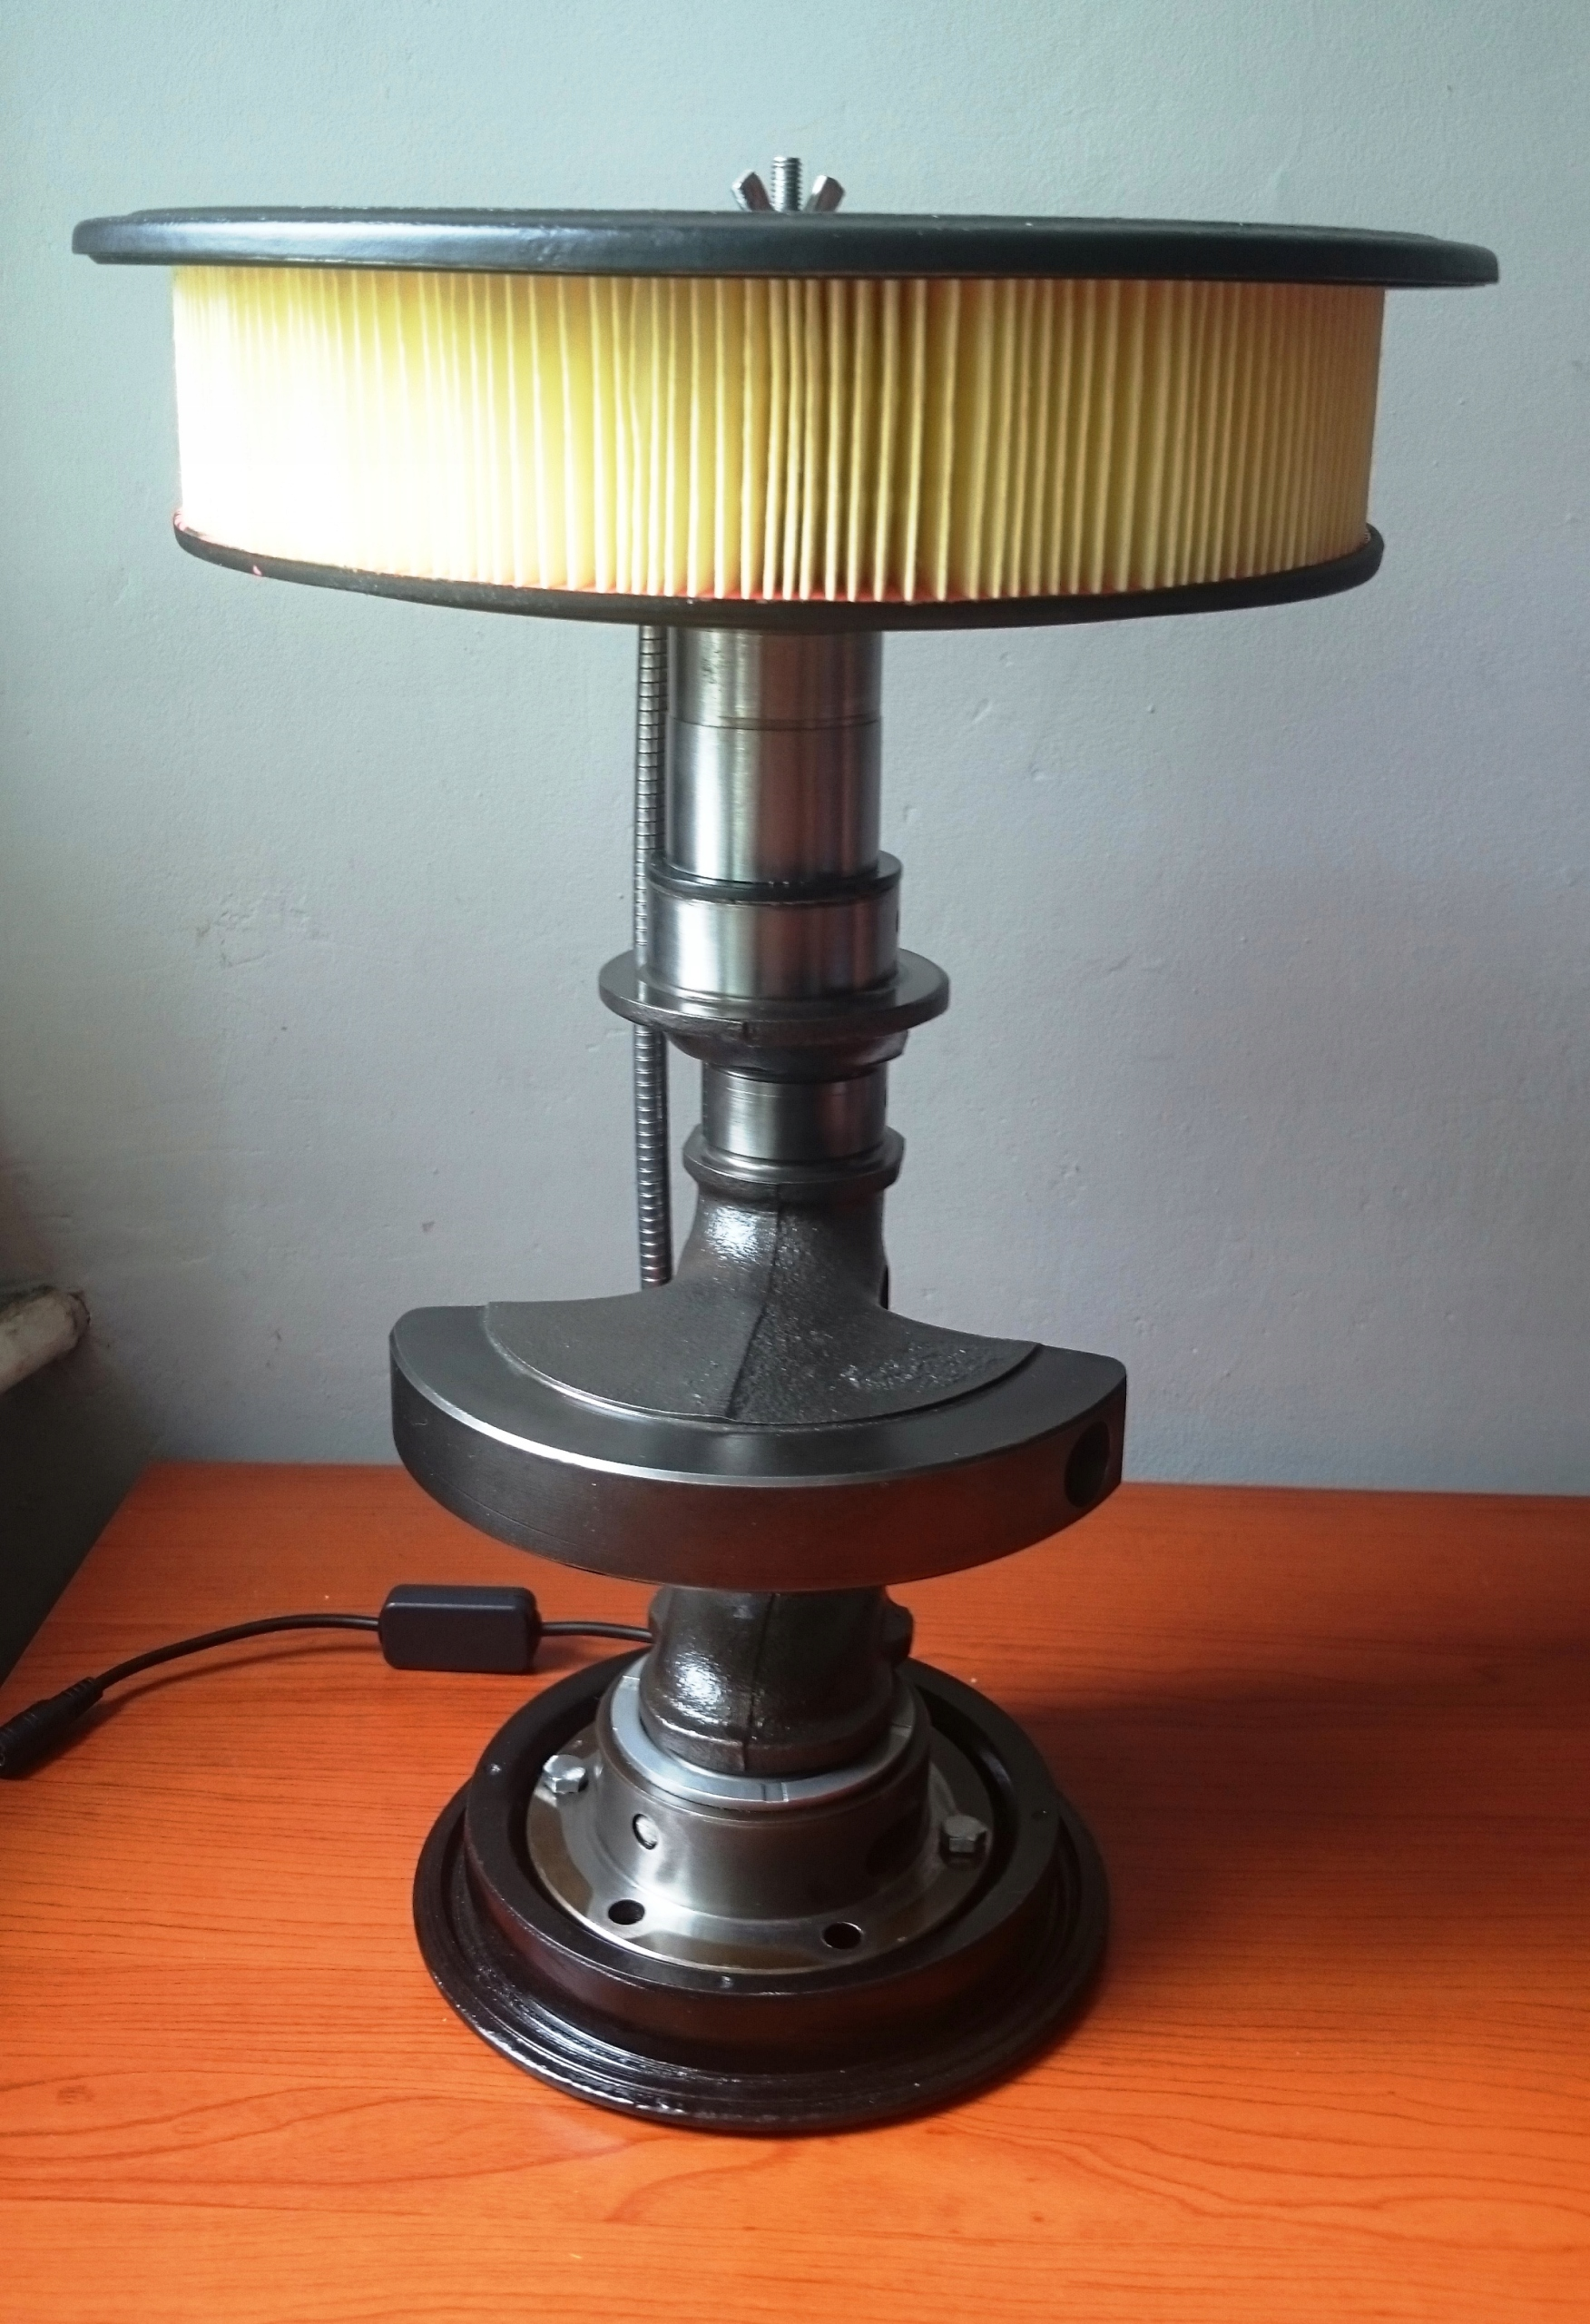 Lampka na biurko fiat 126p maluch FSO